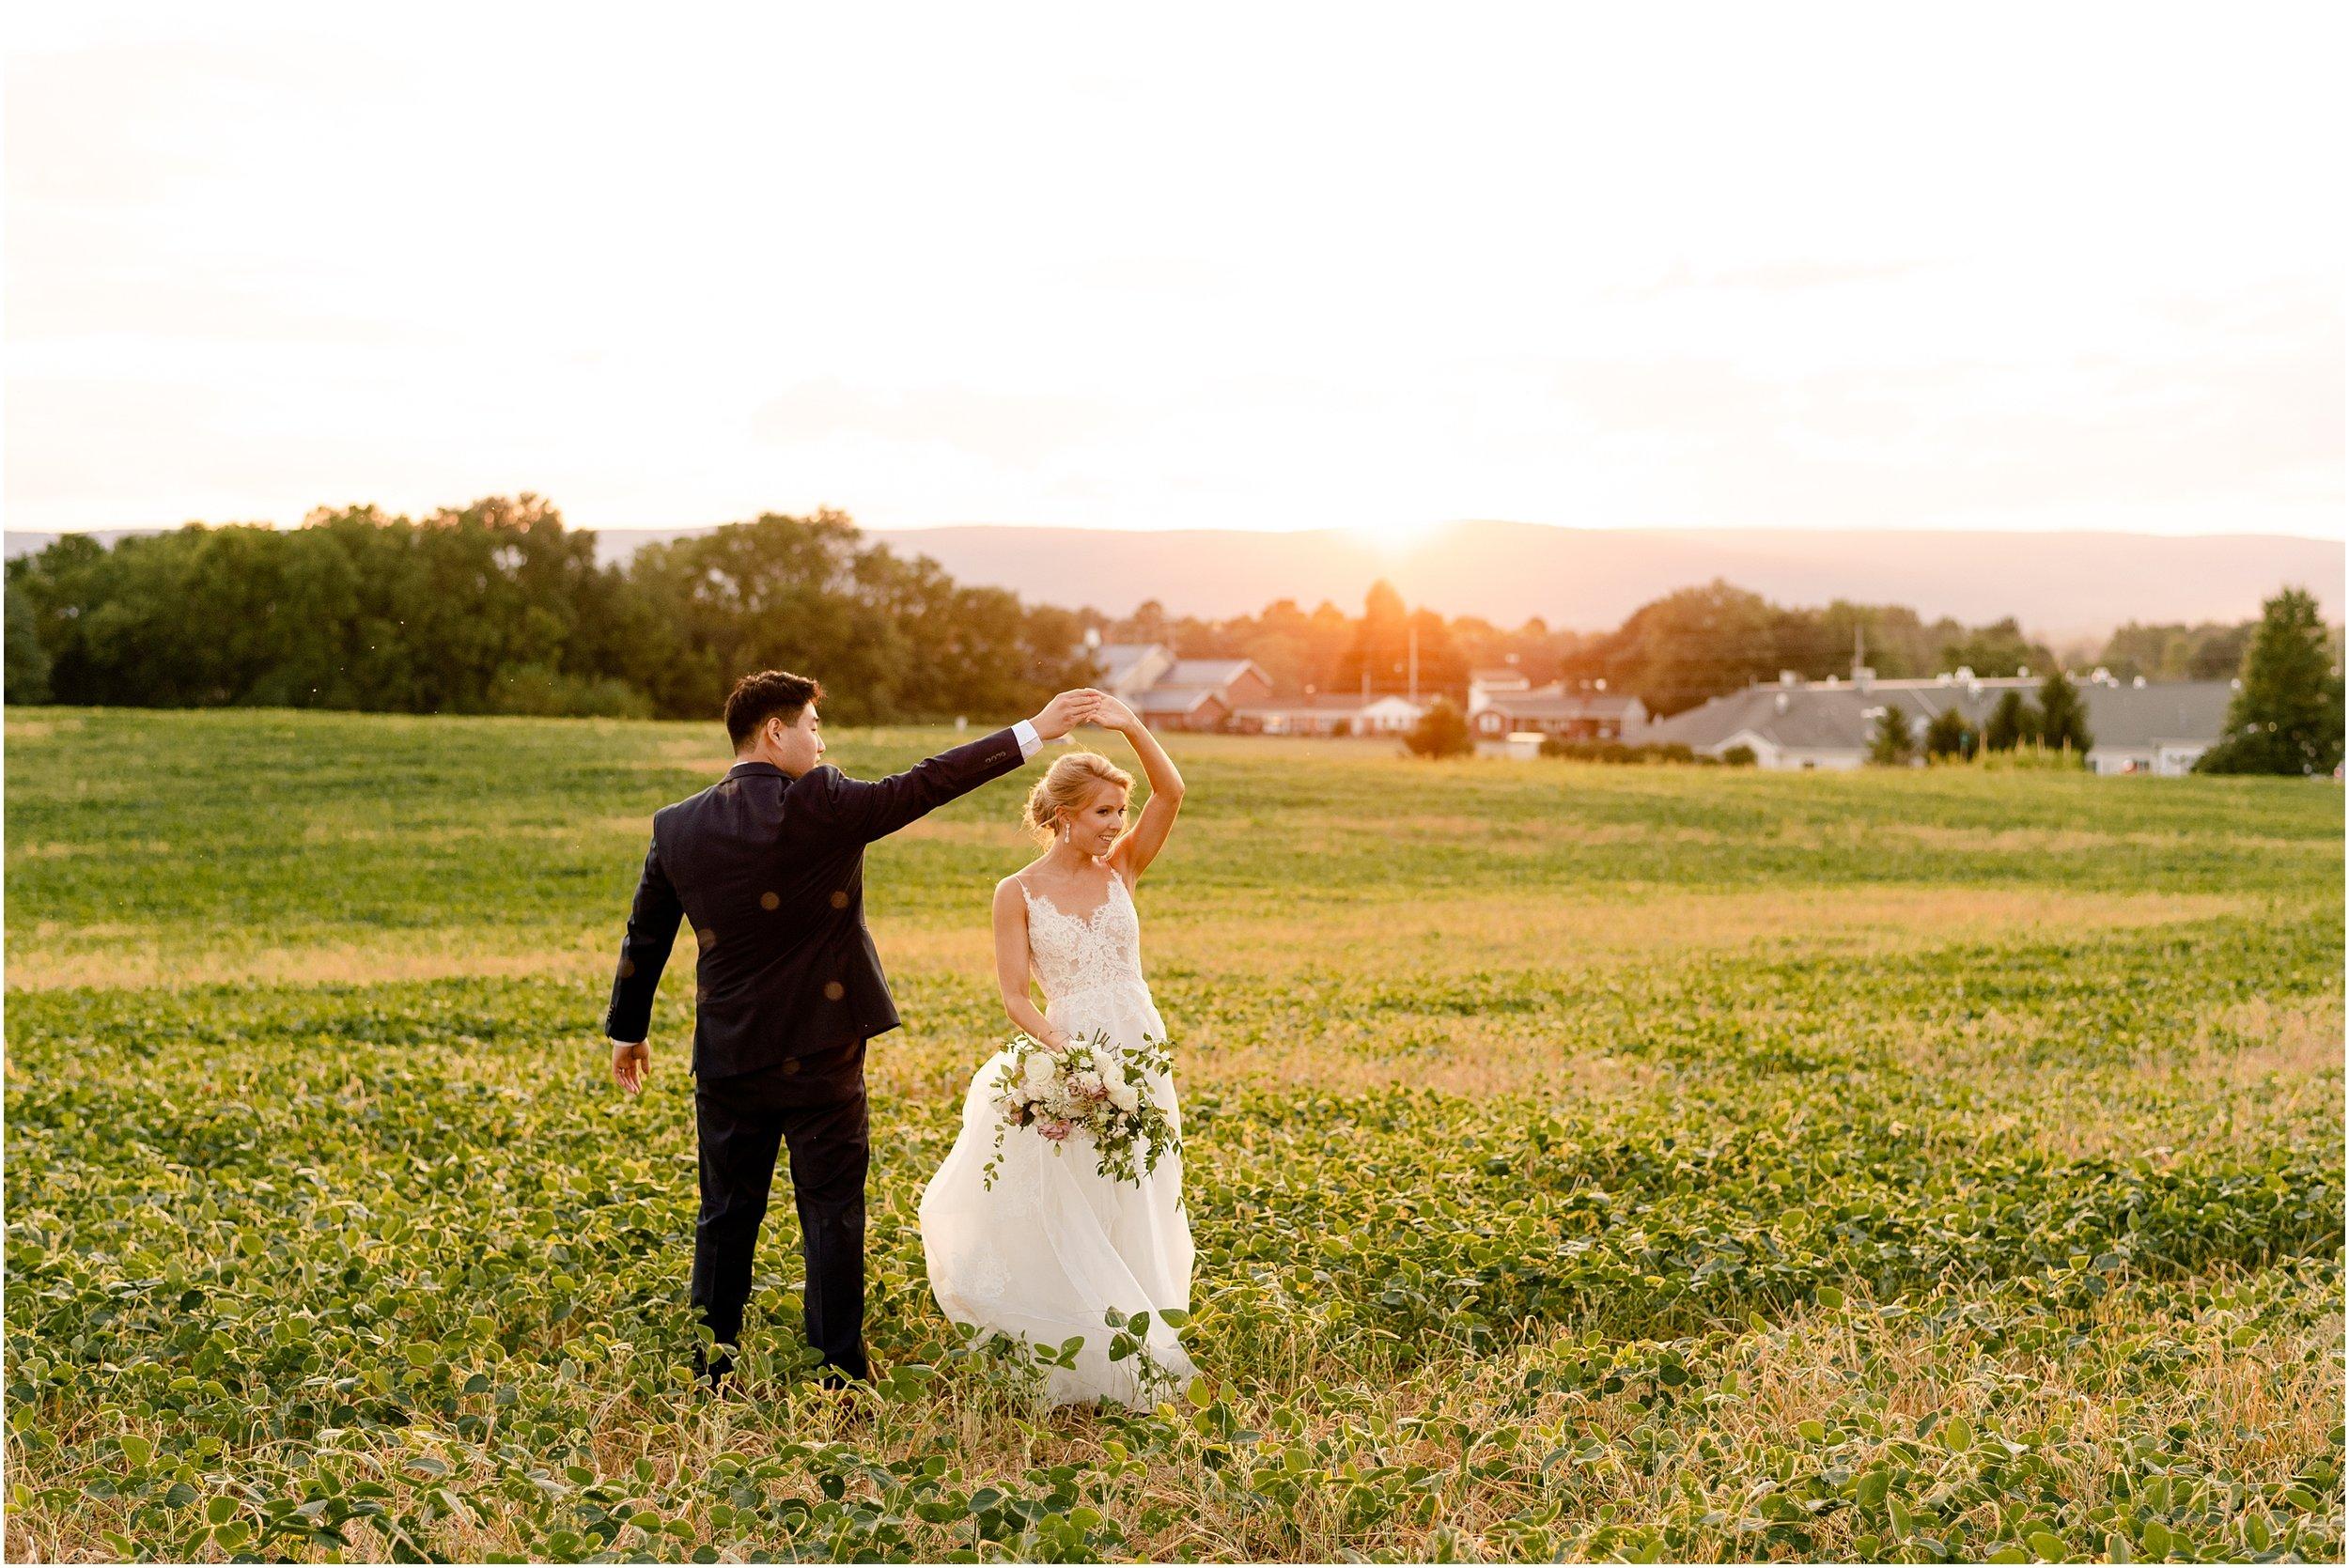 hannah leigh photography Walkers Overlook Wedding Walkersville MD_3566.jpg